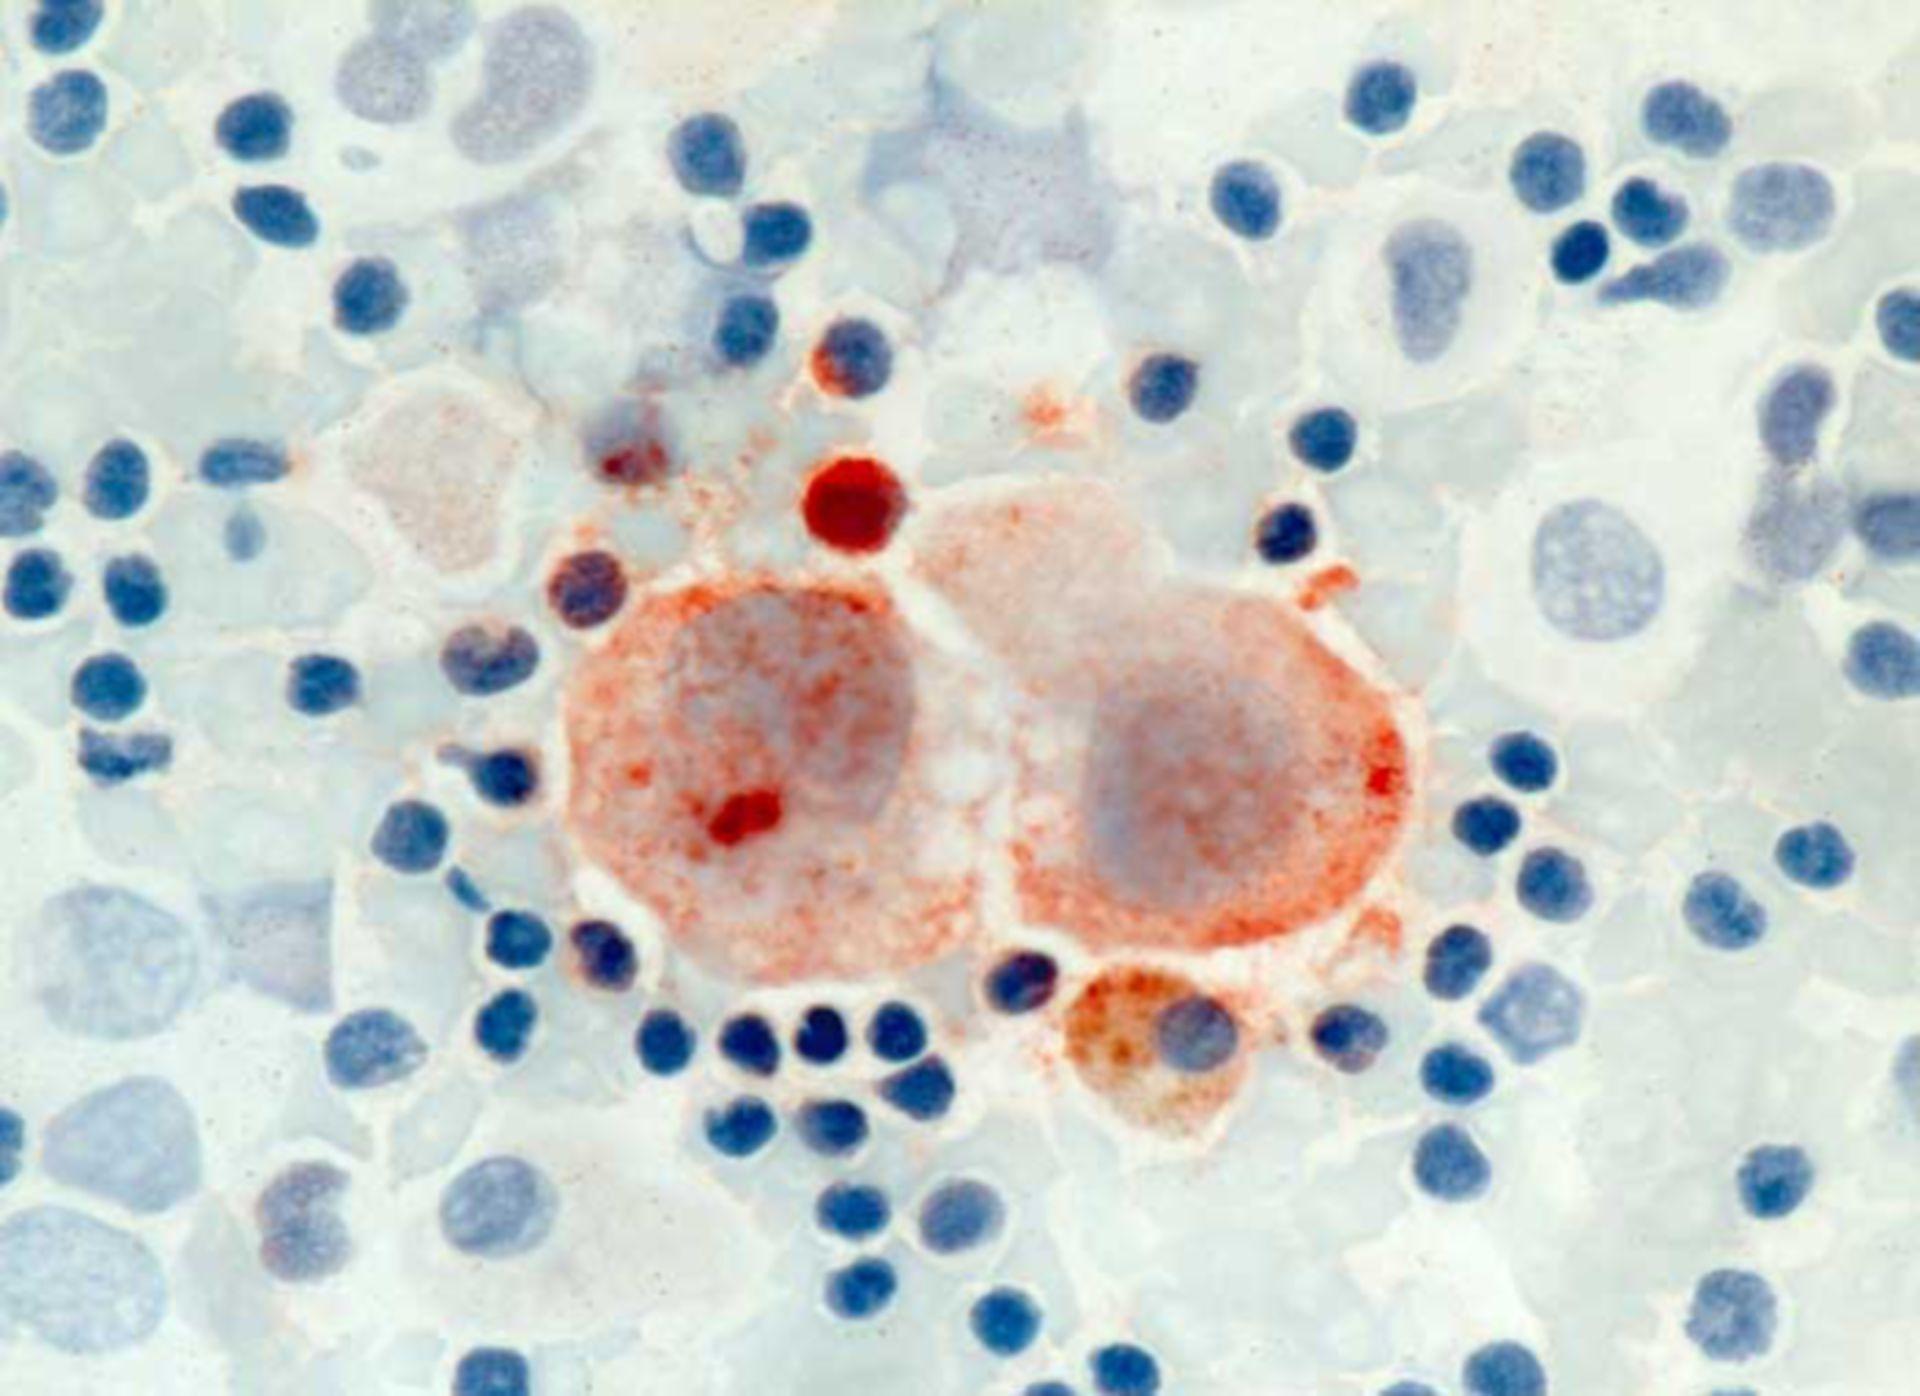 Zytomegalievirusinfekt